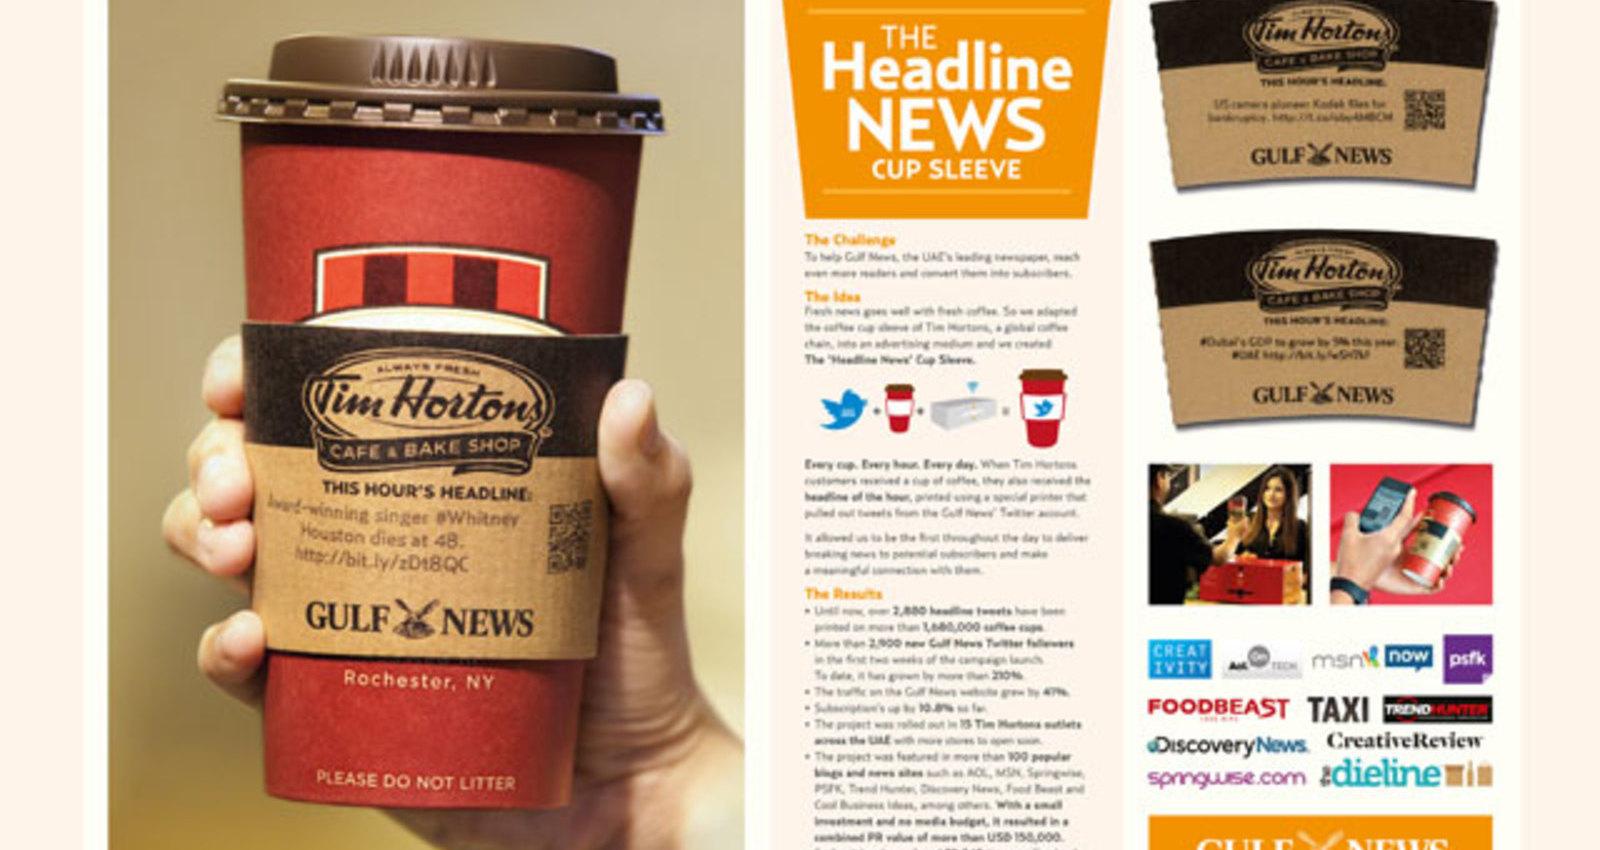 The 'Headline News' Cup Sleeve